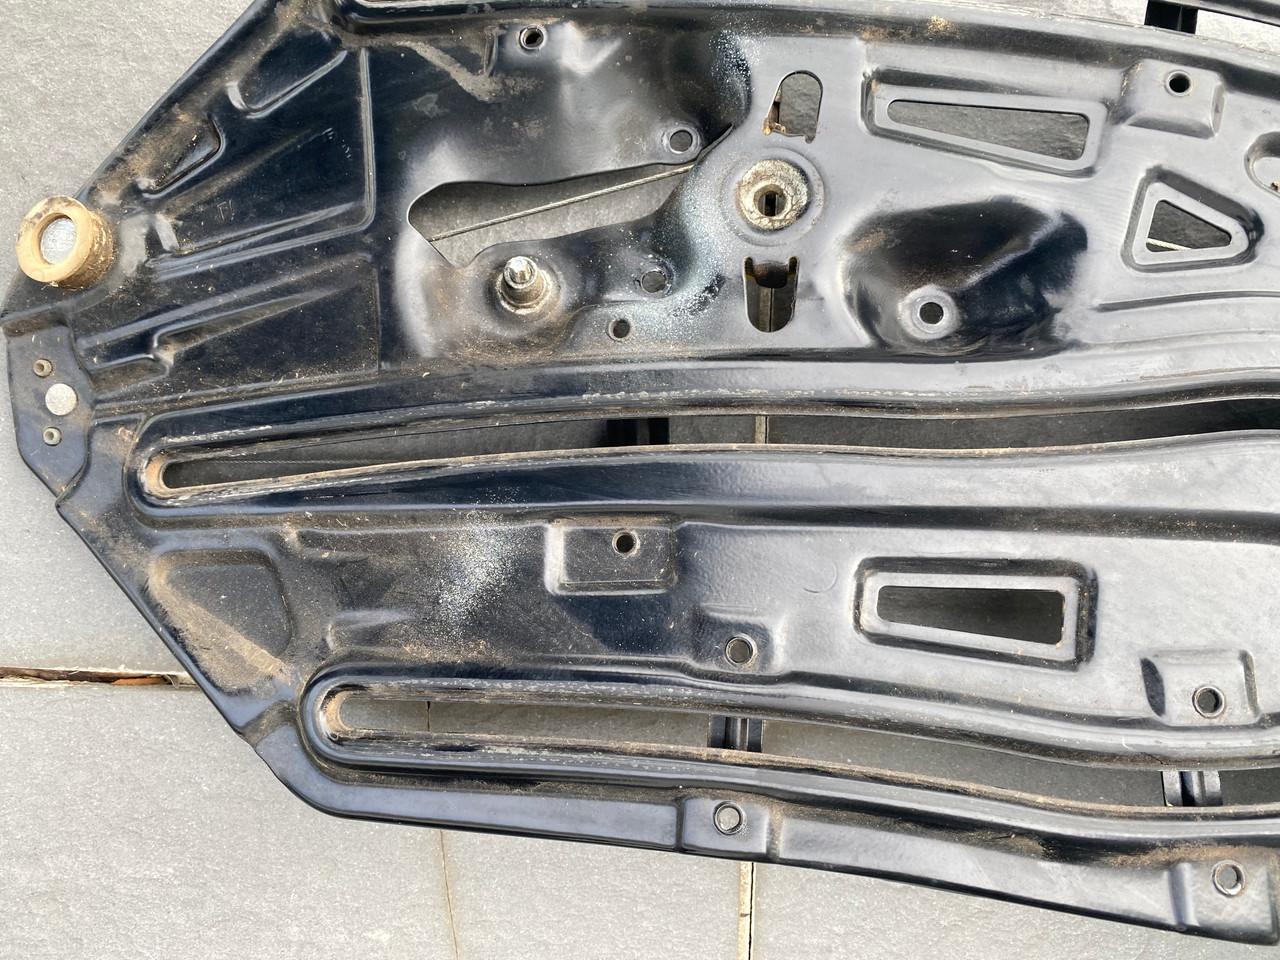 Bmw E46 Convertible Used Lhr Window Regulator 8 215 273 Parts 4 European Cars